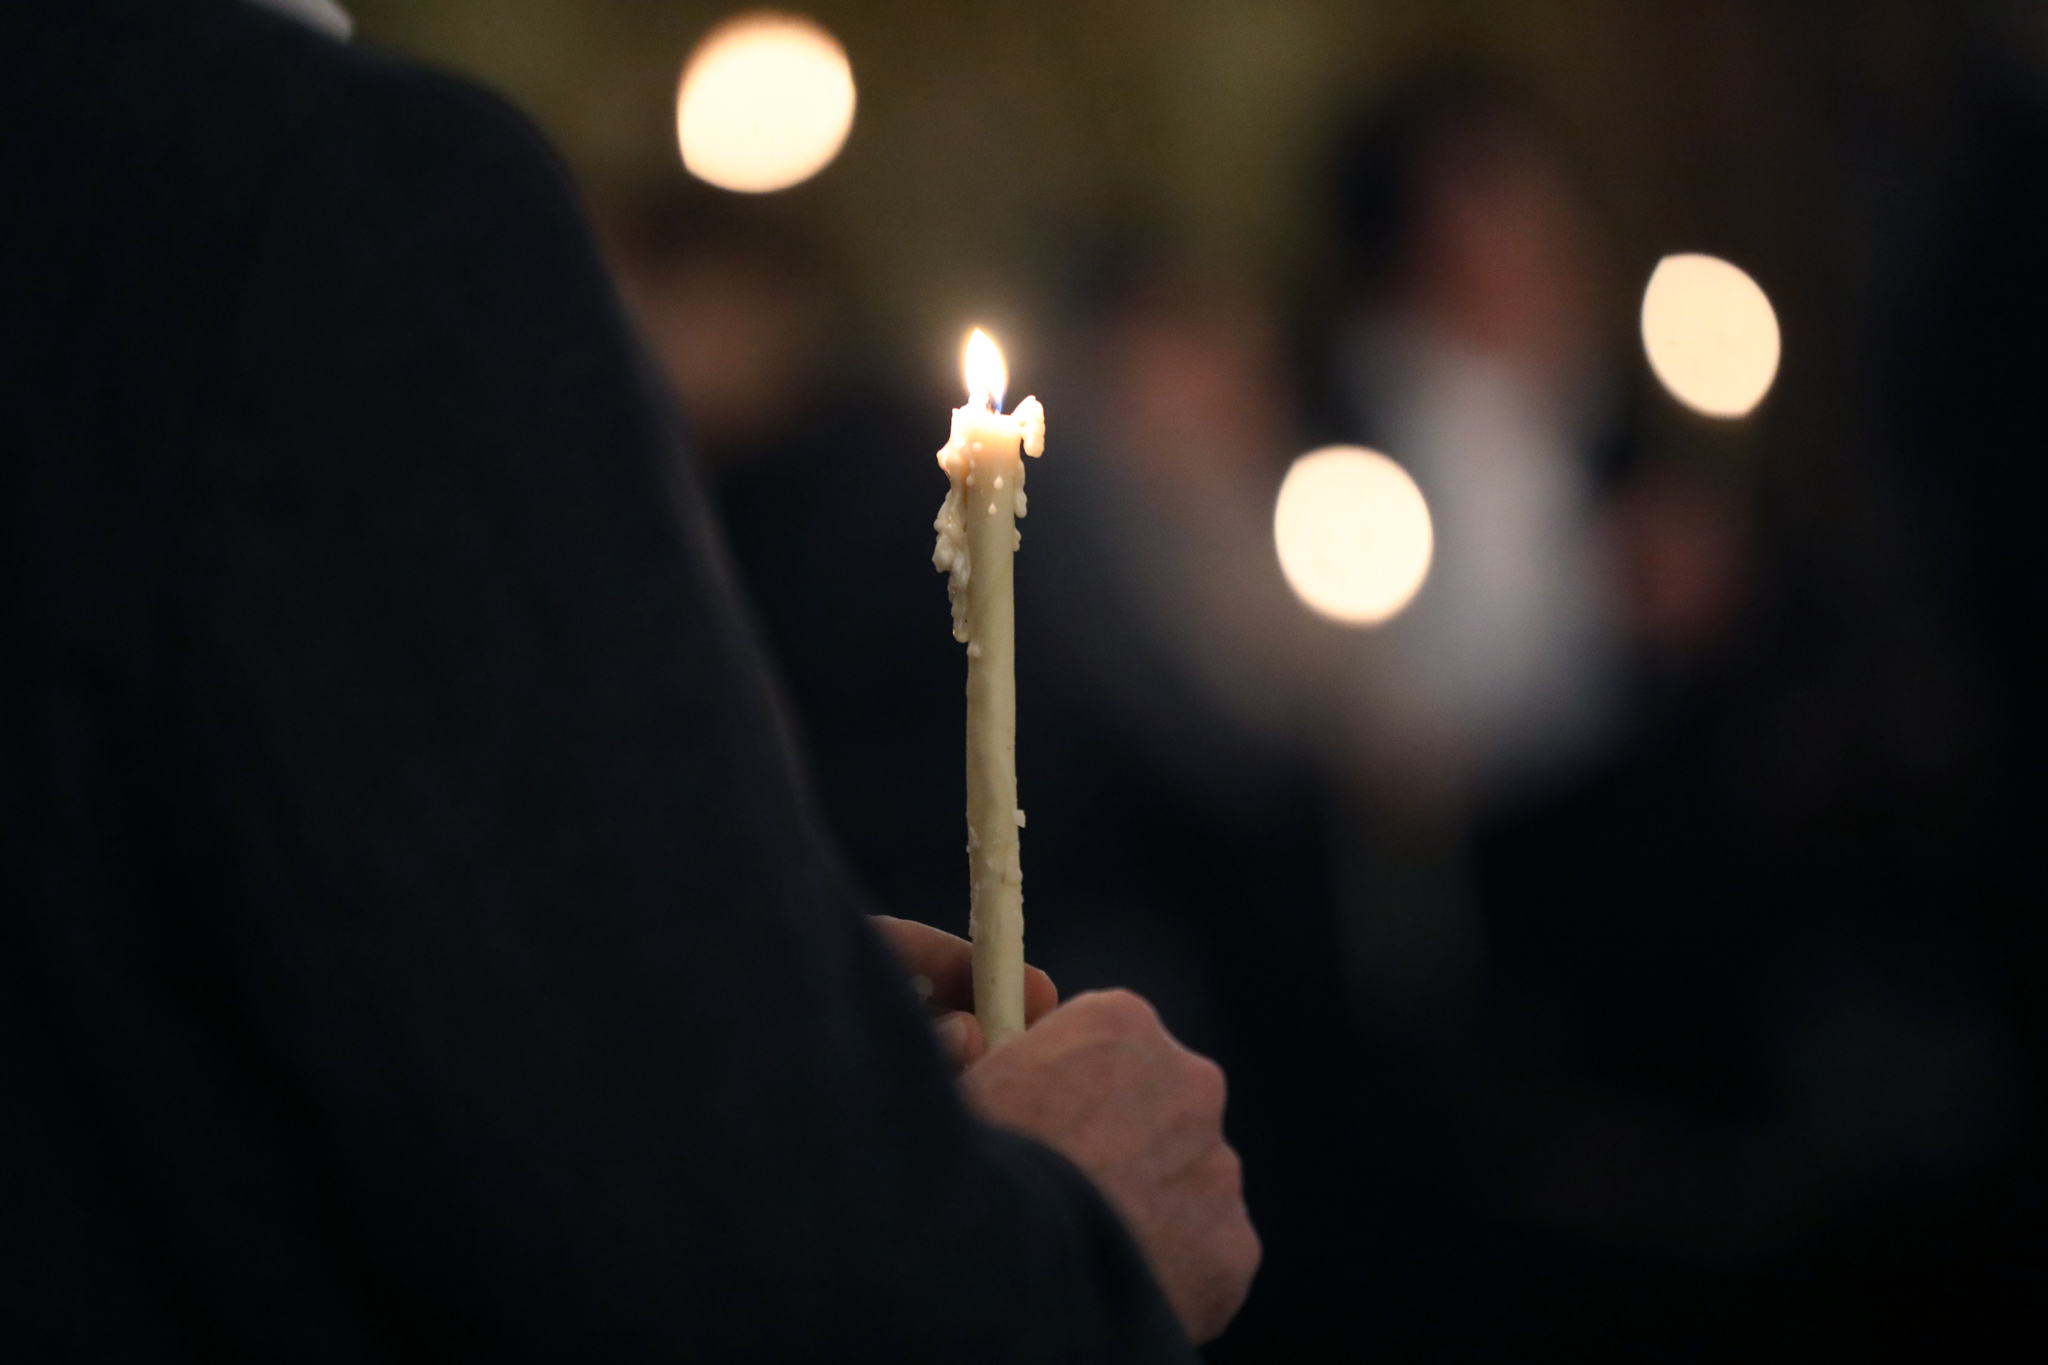 Church 4 Католикос-Патриарх всея Грузии Католикос-Патриарх всея Грузии